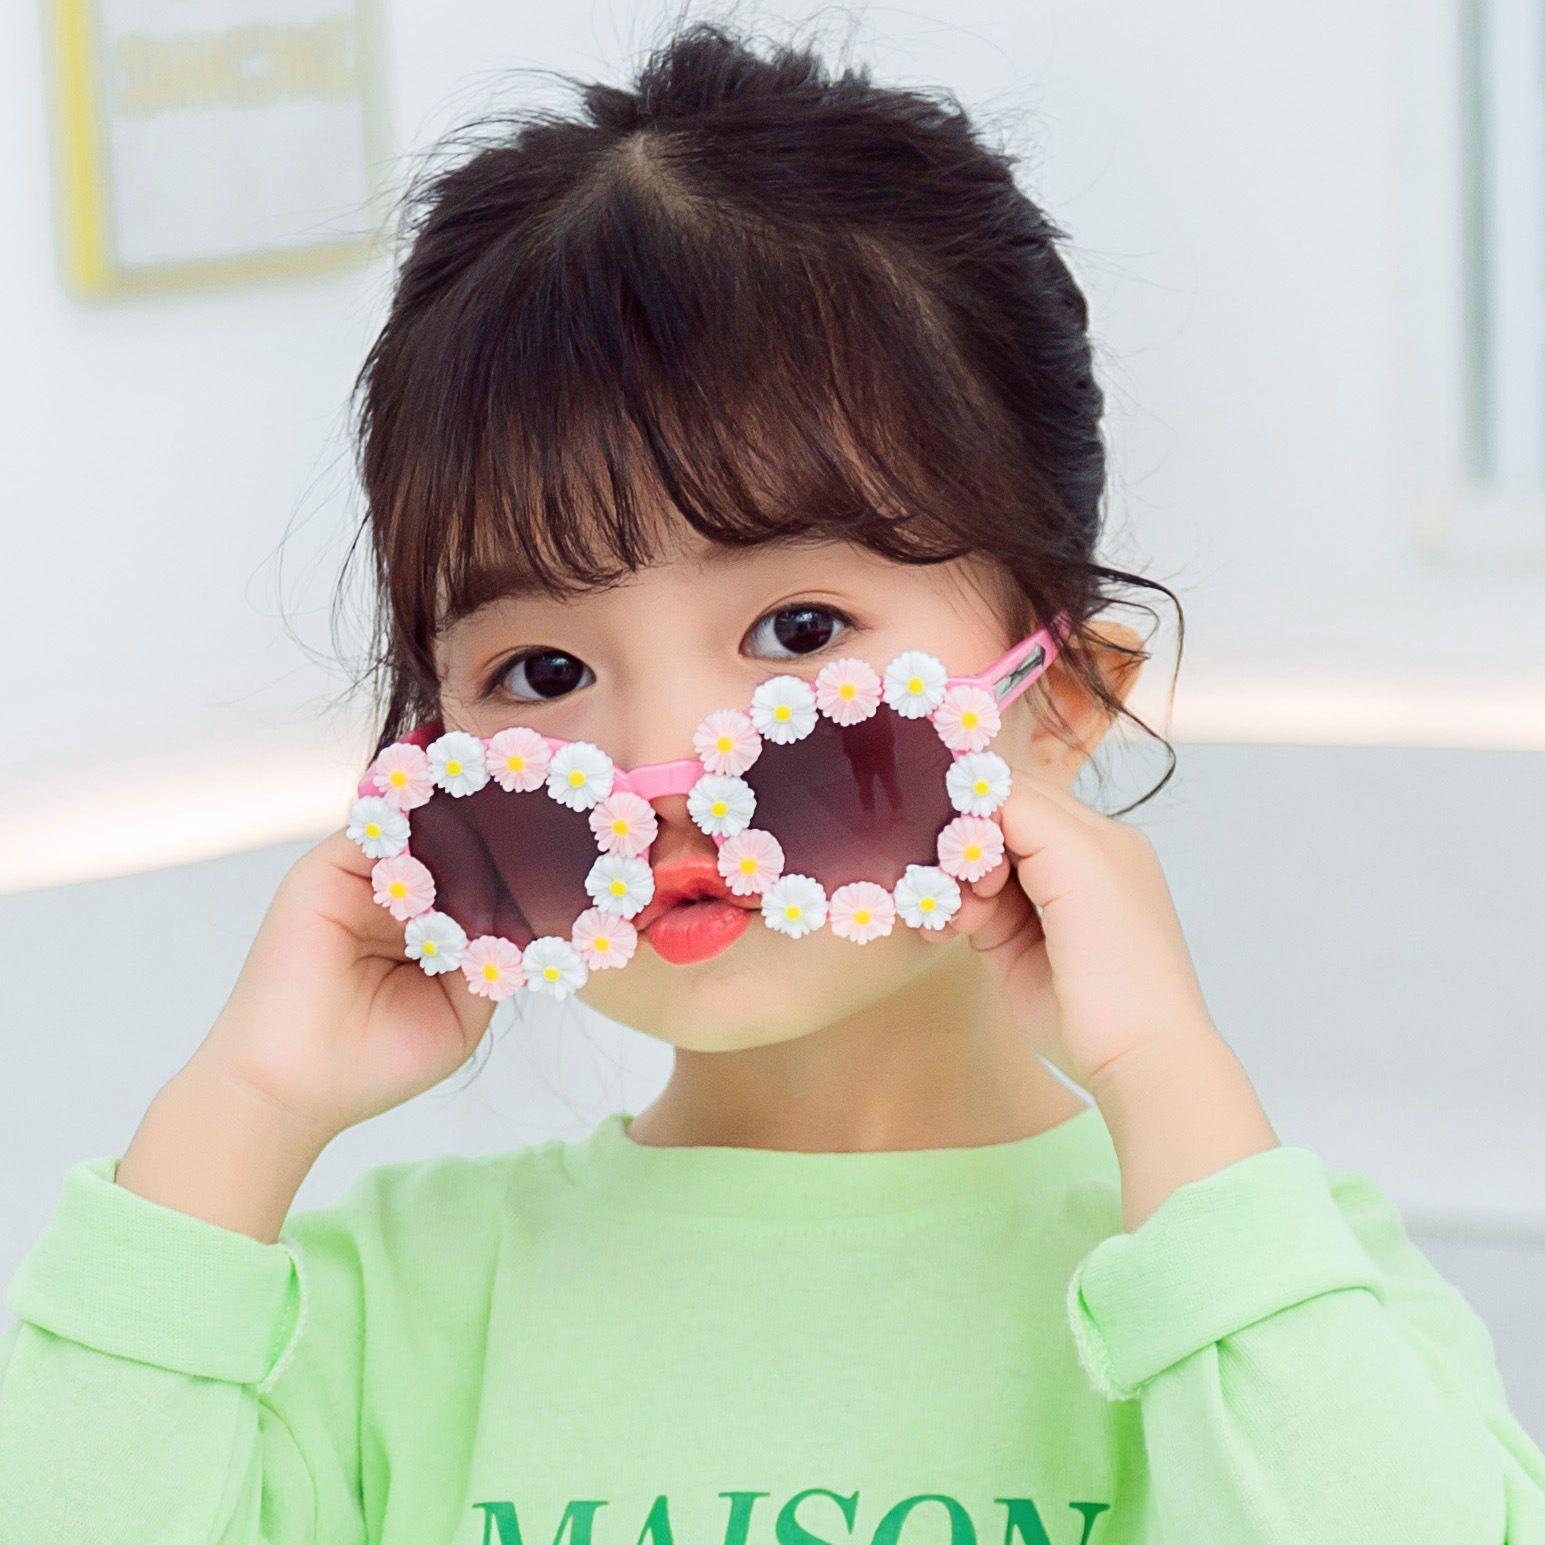 New Daisy Girls Sunglasses Cute Kids Flower Fashion Adumbral Glasses Children Clothing with Sun Eyeglasses Decorative Glasses C6701